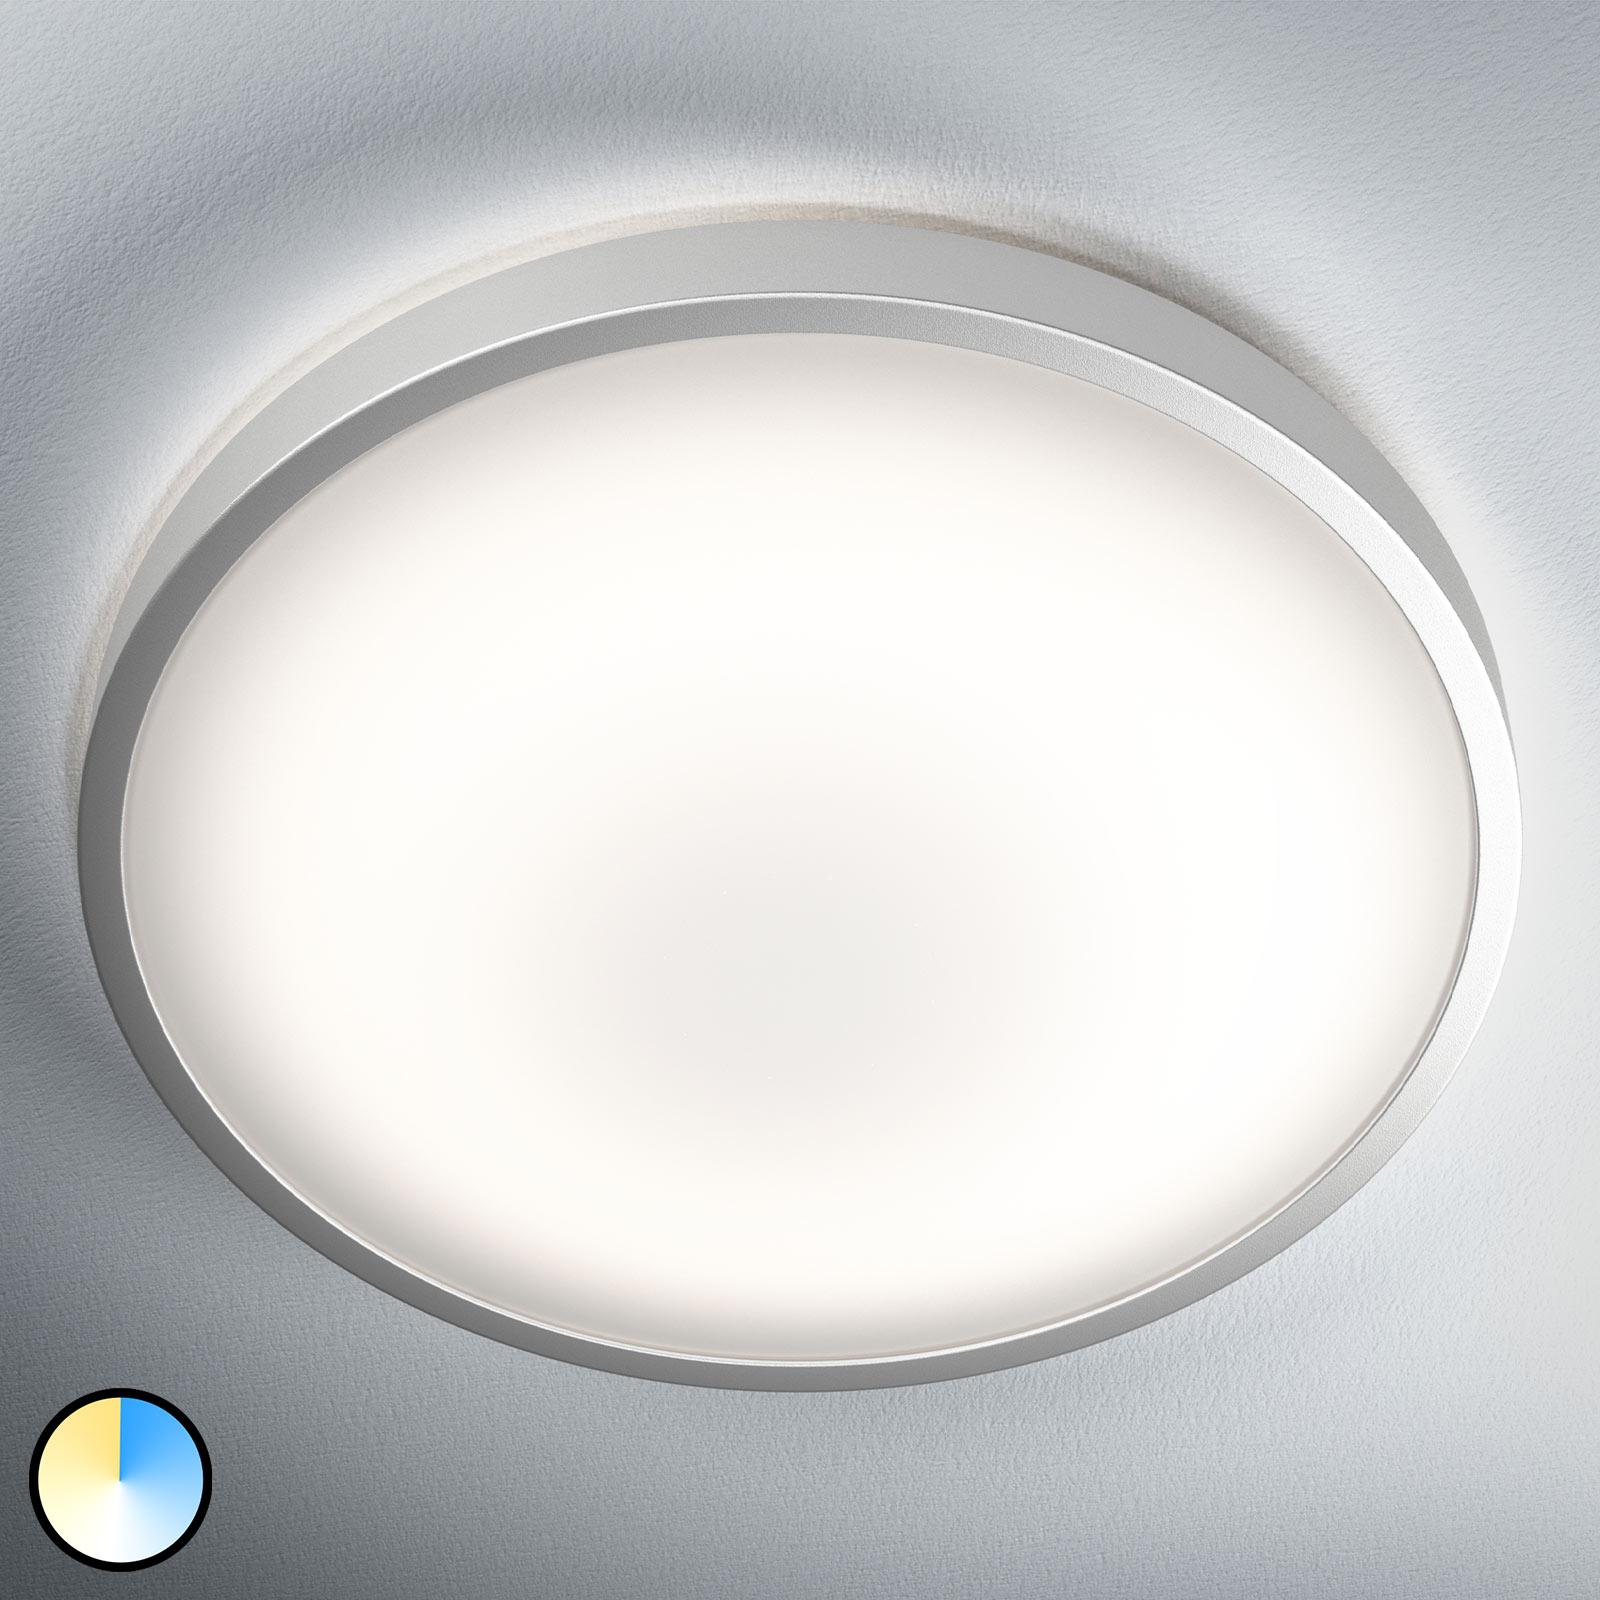 LEDVANCE Orbis lampa sufitowa LED 40 cm Remote-CCT